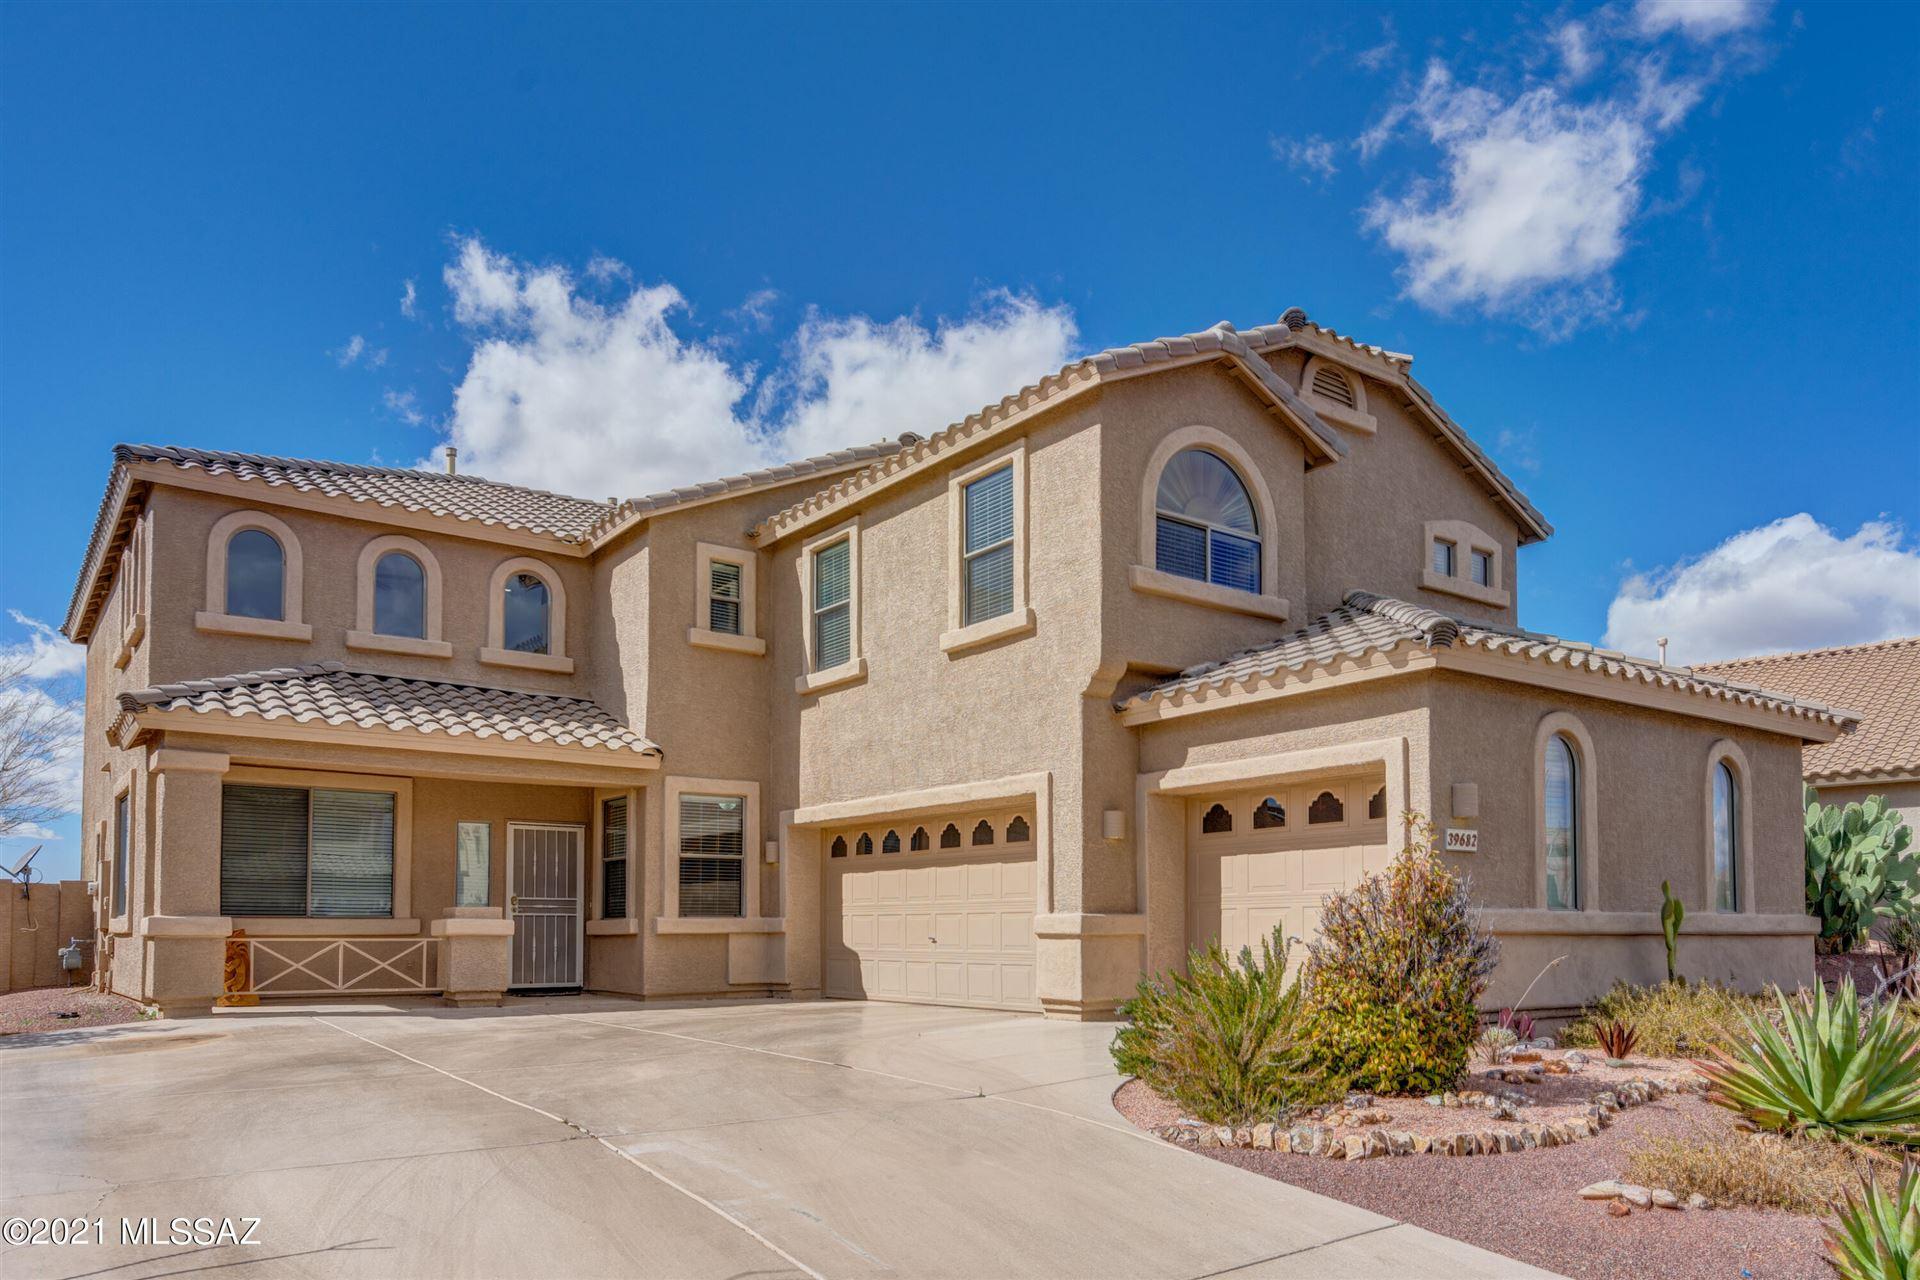 39682 S Mountain Shadow Drive, Tucson, AZ 85739 - MLS#: 22106756